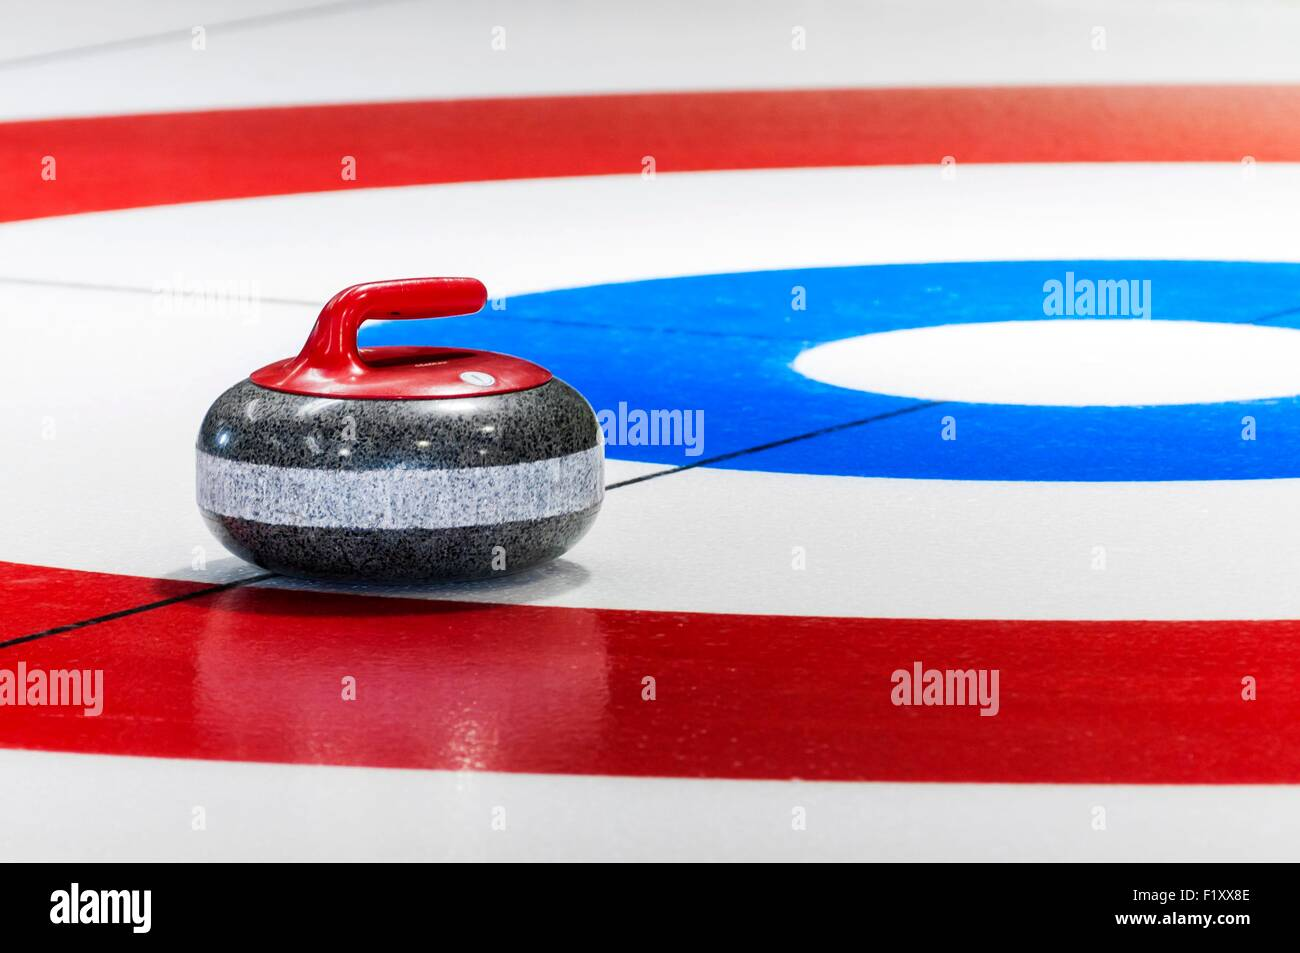 Canada, Quebec, Outaouais, curling ice skate at Montebello - Stock Image